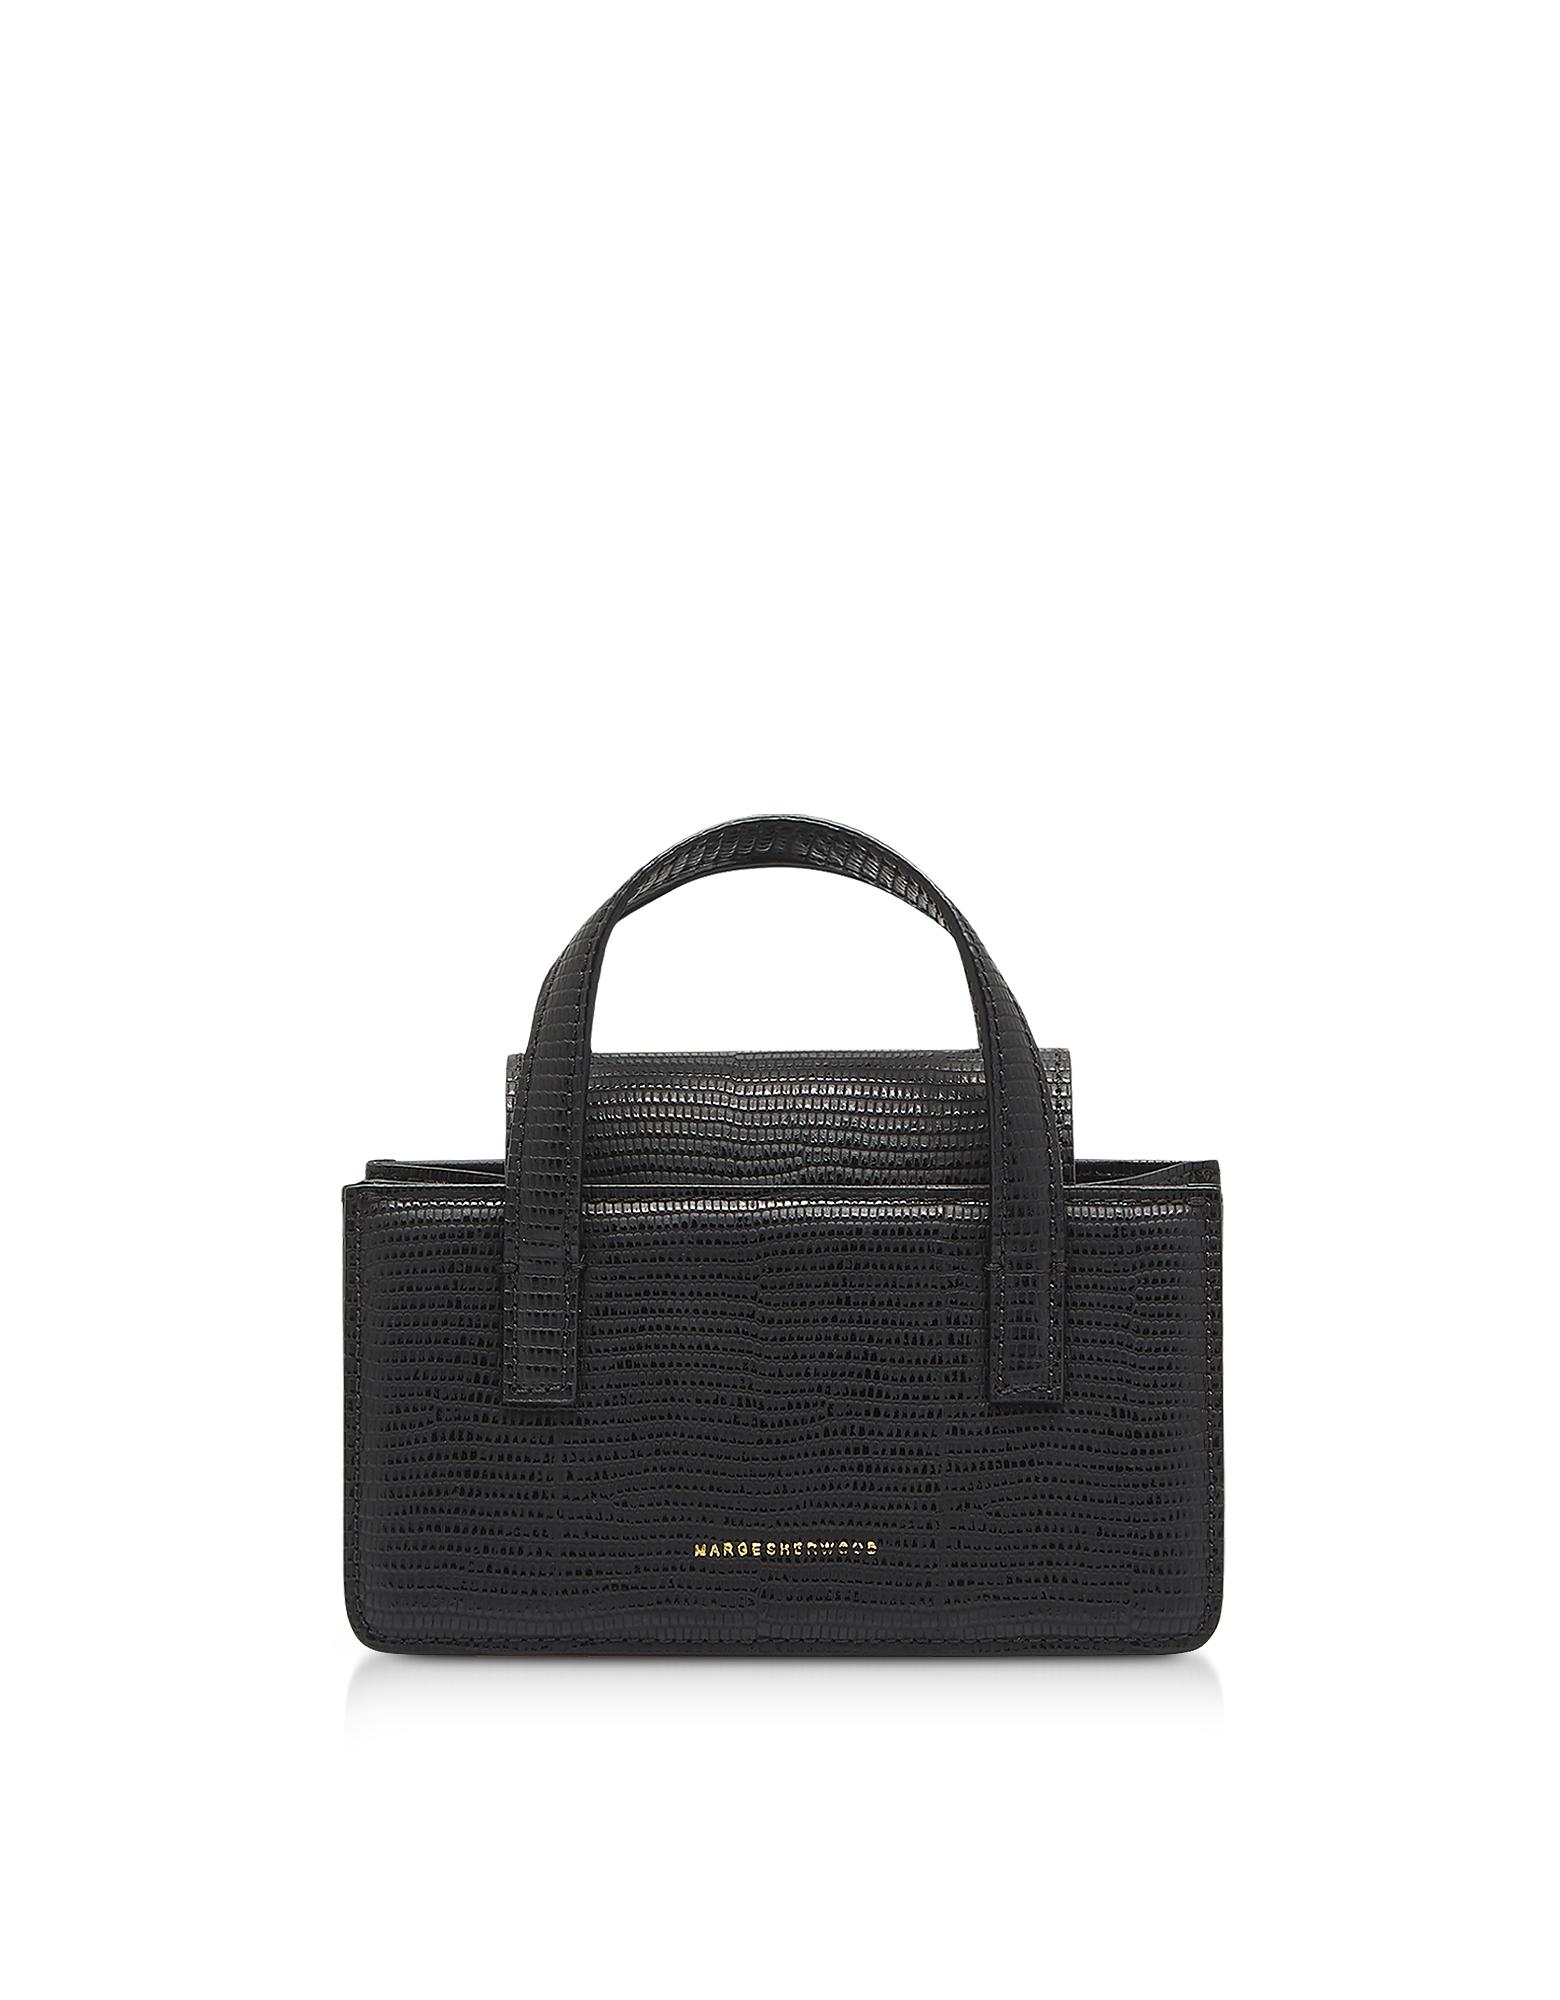 Marge Sherwood Designer Handbags, Lizard Embossed Leather Grandma Mini Tote